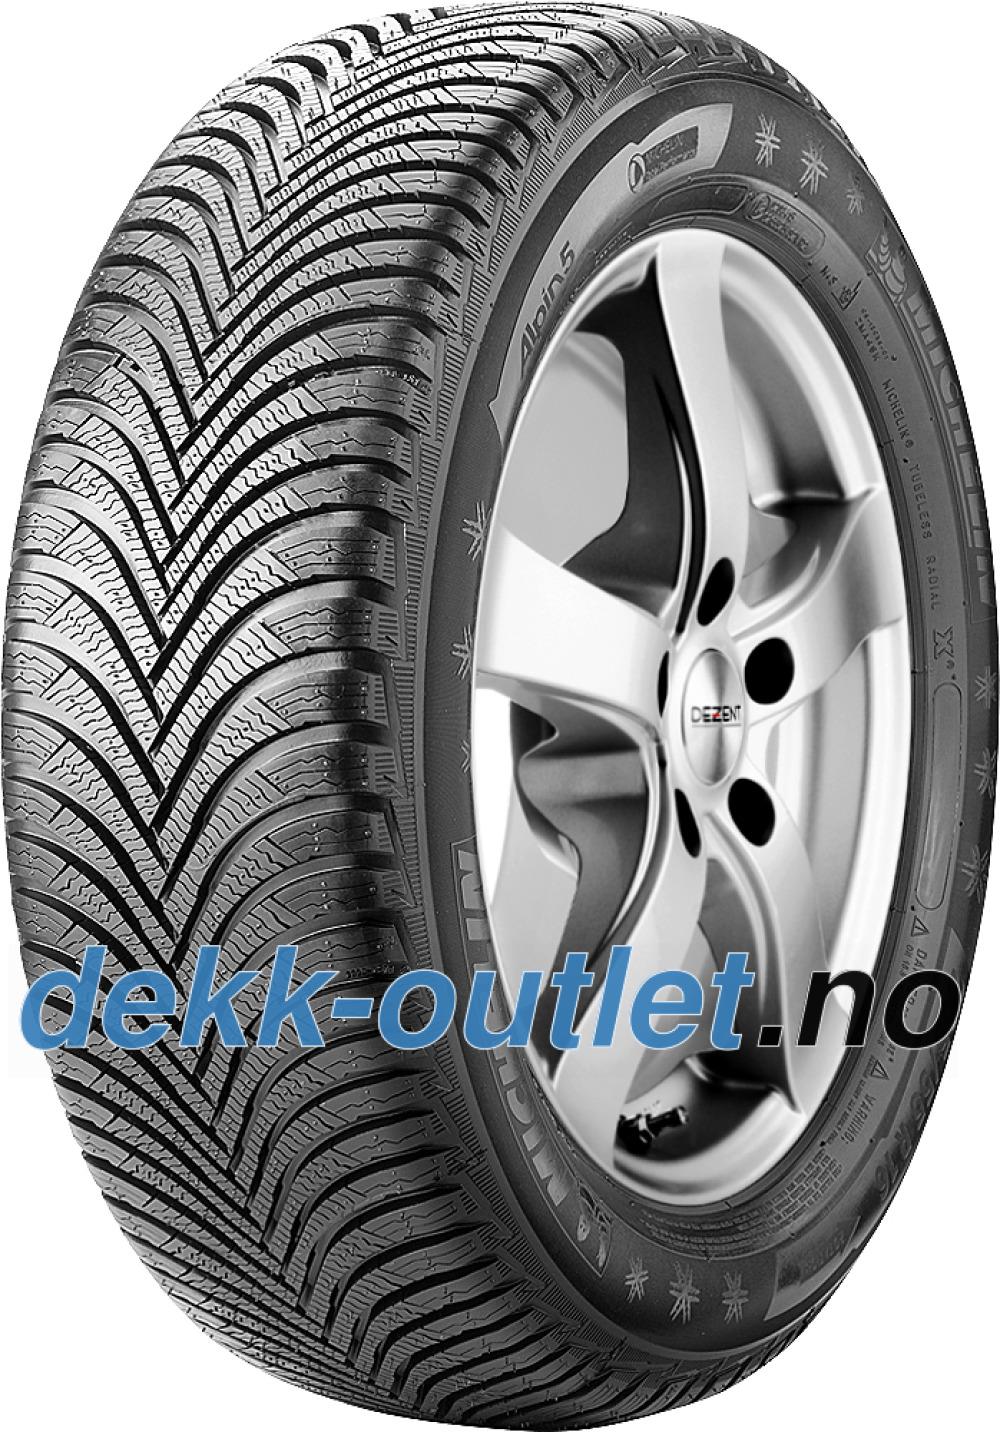 Michelin Alpin 5 ( 225/50 R16 96H XL )